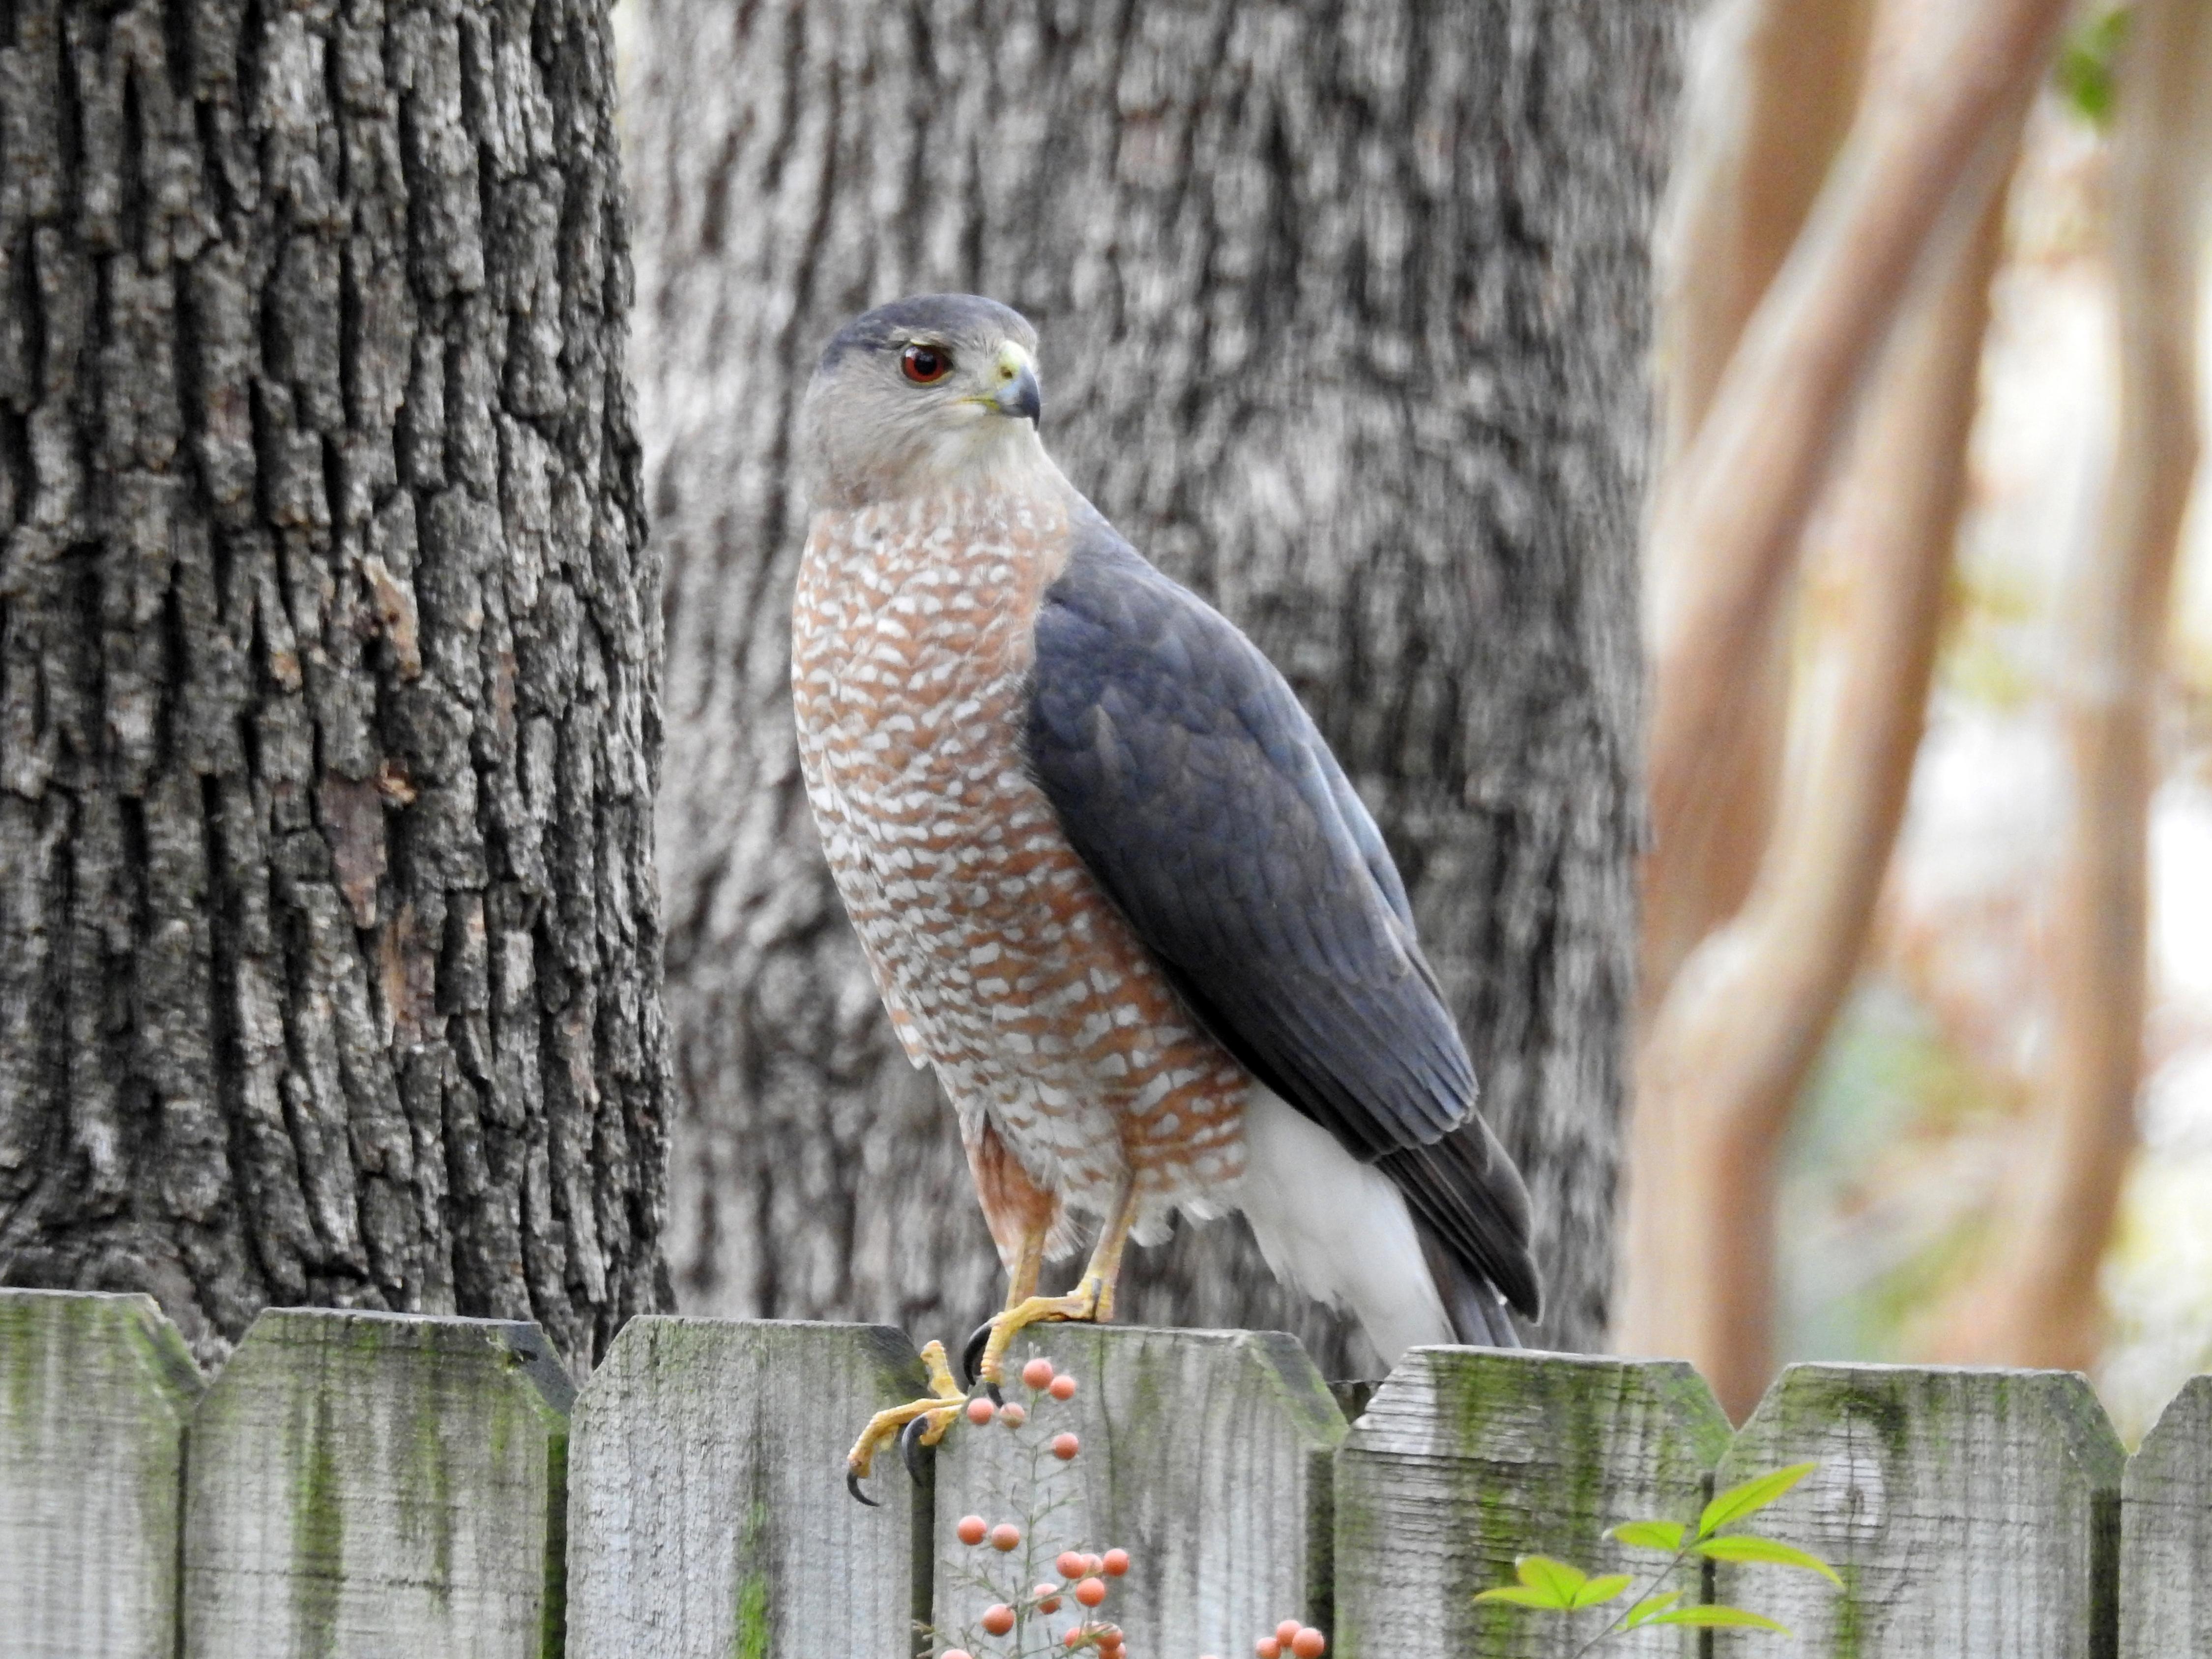 Divine Inspiration Photo #1A - Adult Cooper's Hawk - 8 x 10